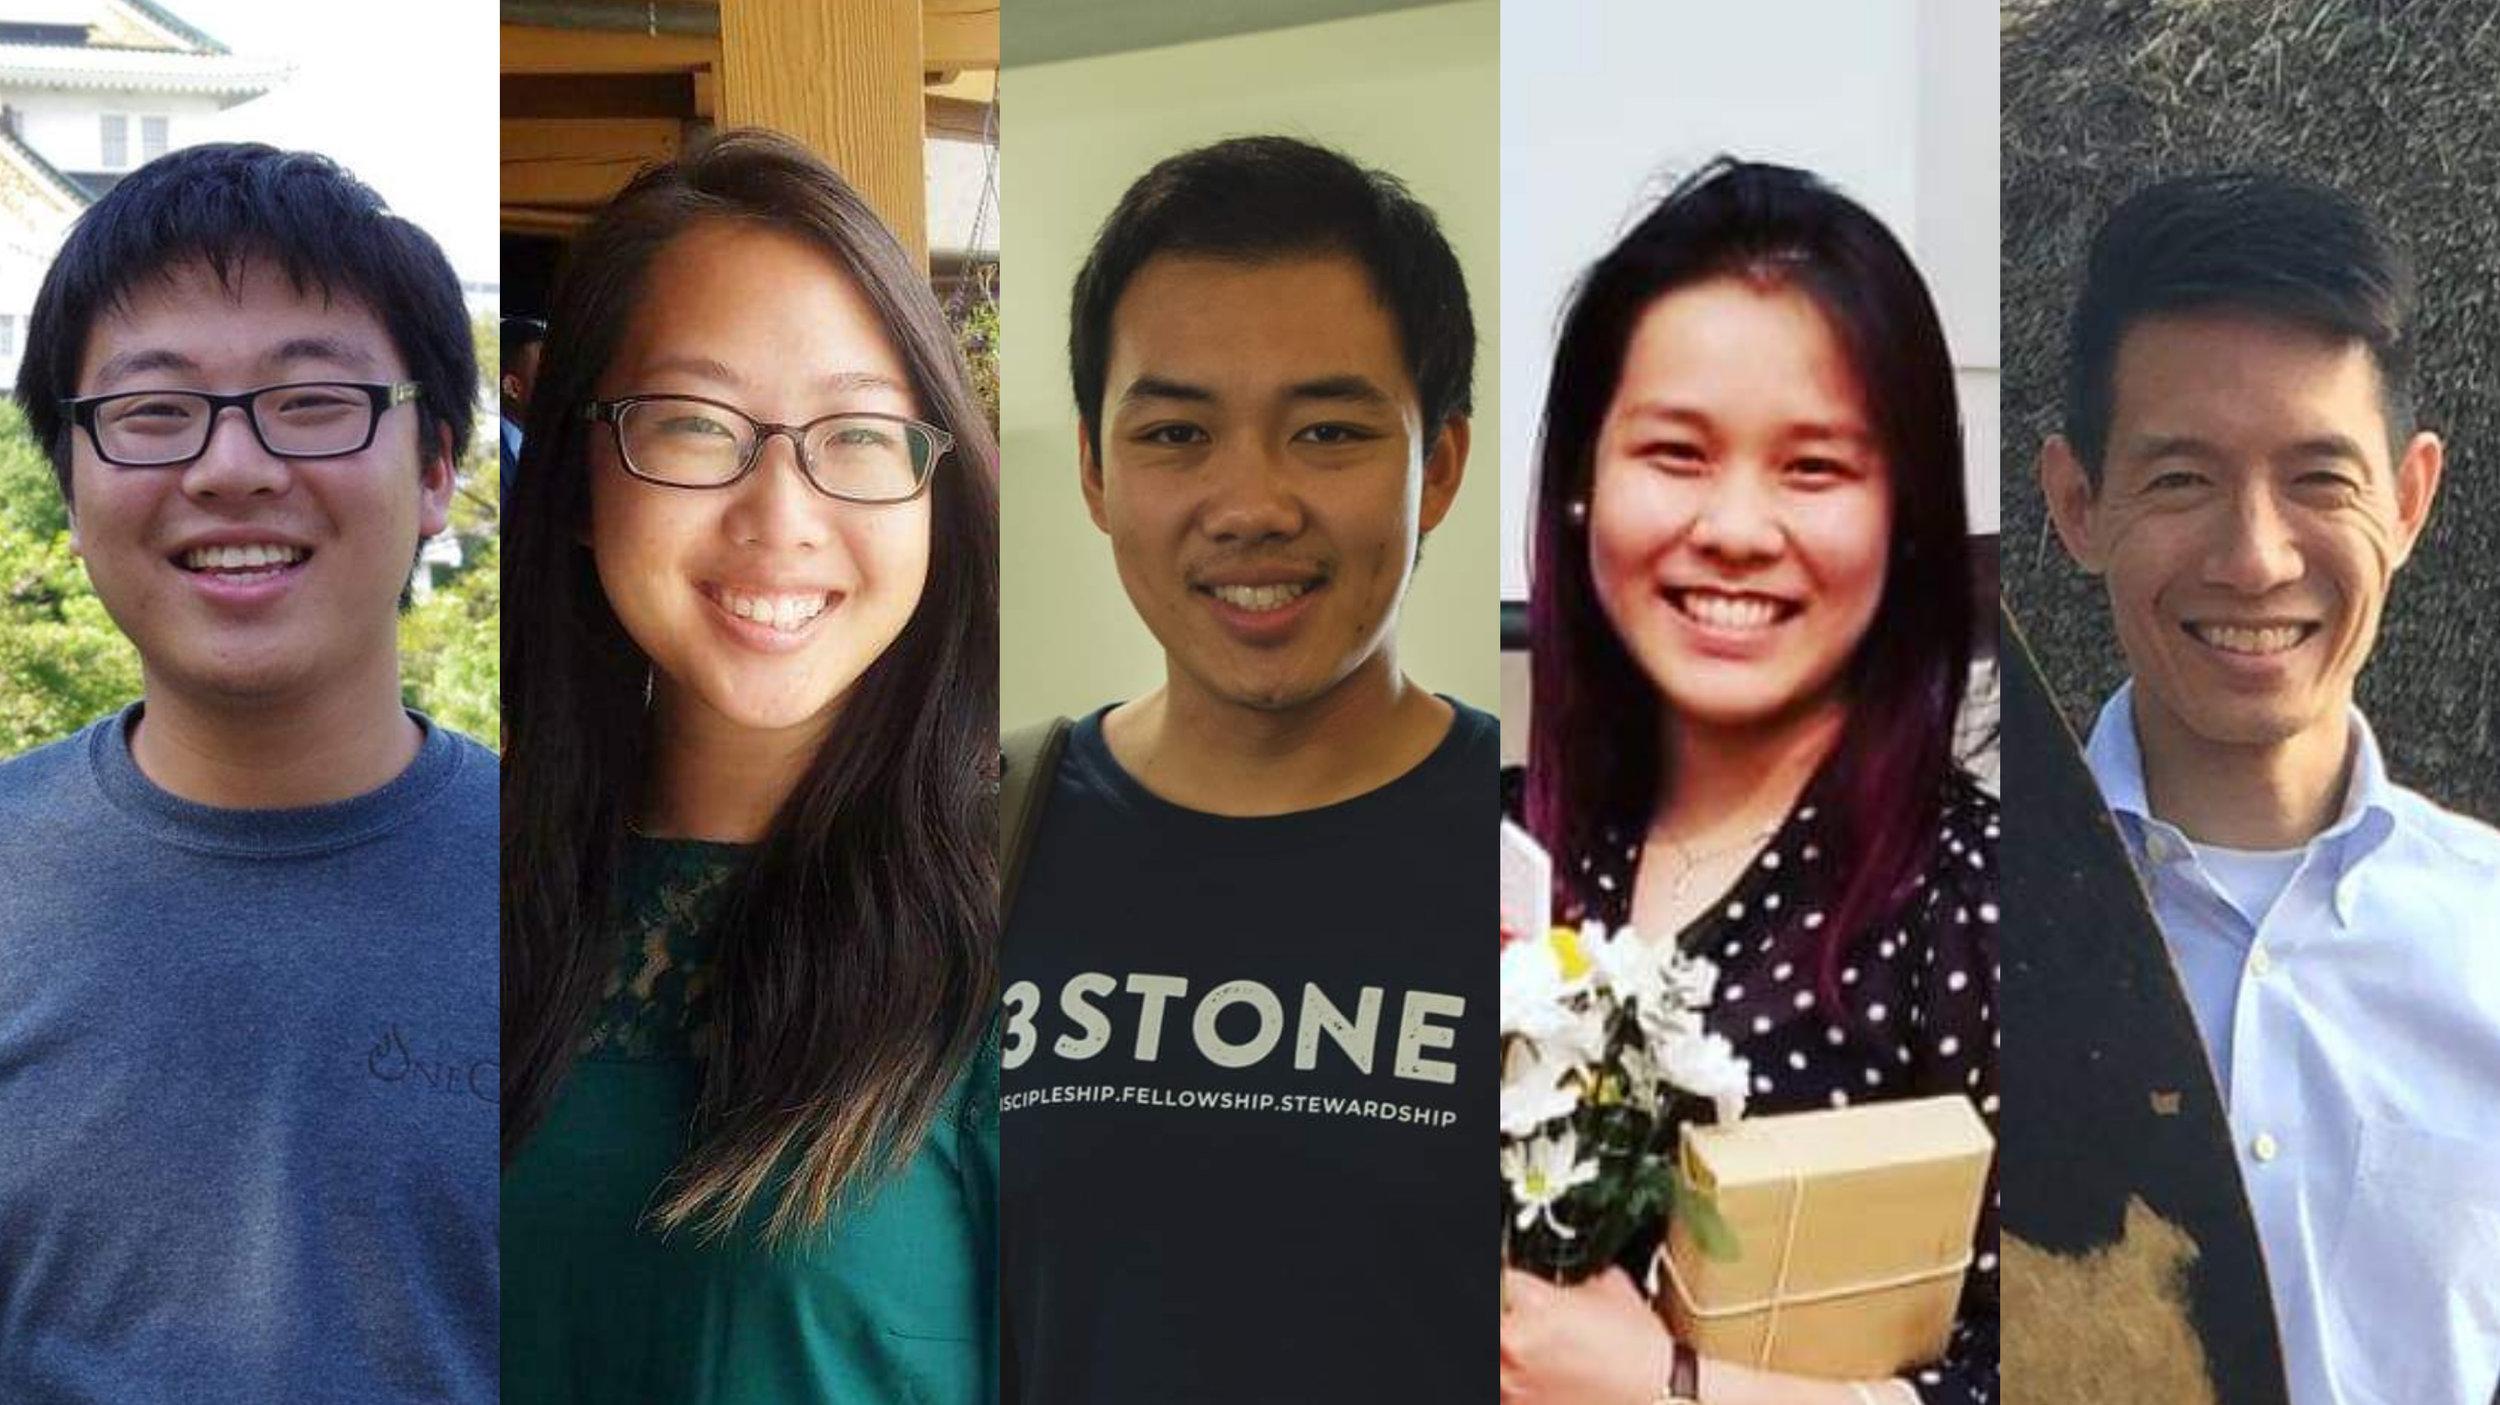 3Stone Taiwan 2019 team: Caleb Wu, Jessica Lau, Justin Mui, Liza Sang, Rev. Stephen Ko